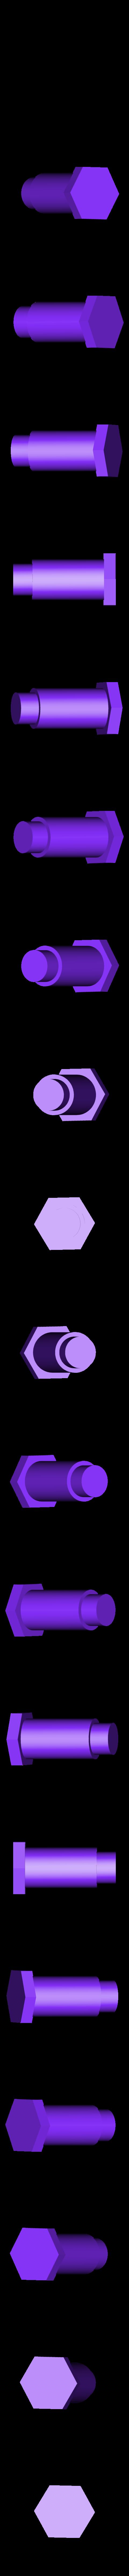 CrossHead_Pin.STL Download free STL file 4-8-8-4 Big Boy Locomotive • 3D printer object, RaymondDeLuca